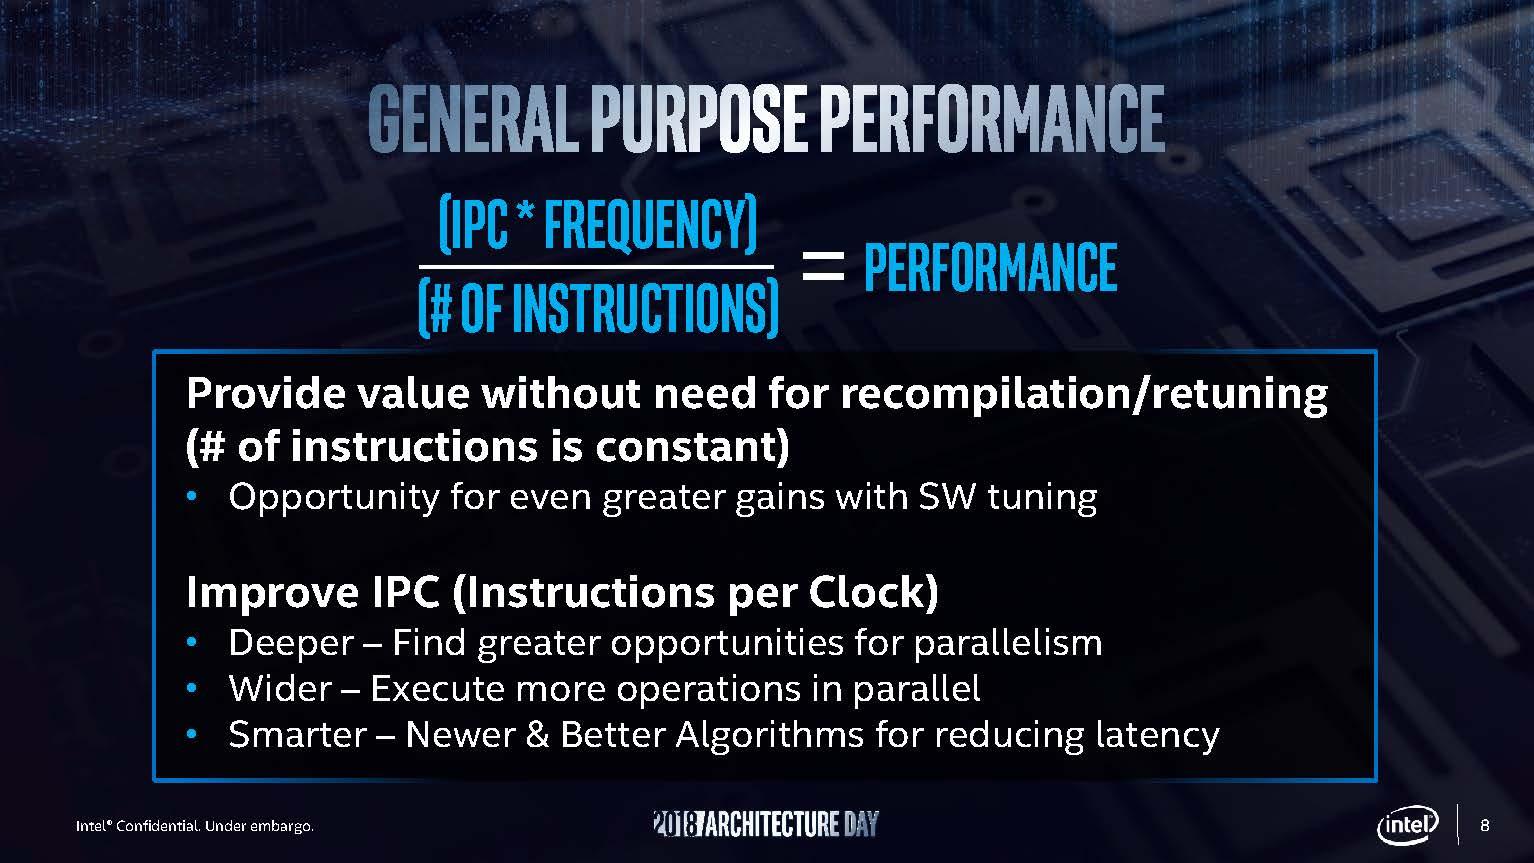 Intel Architecture Day 2018 CPU Core General Purpose Performance